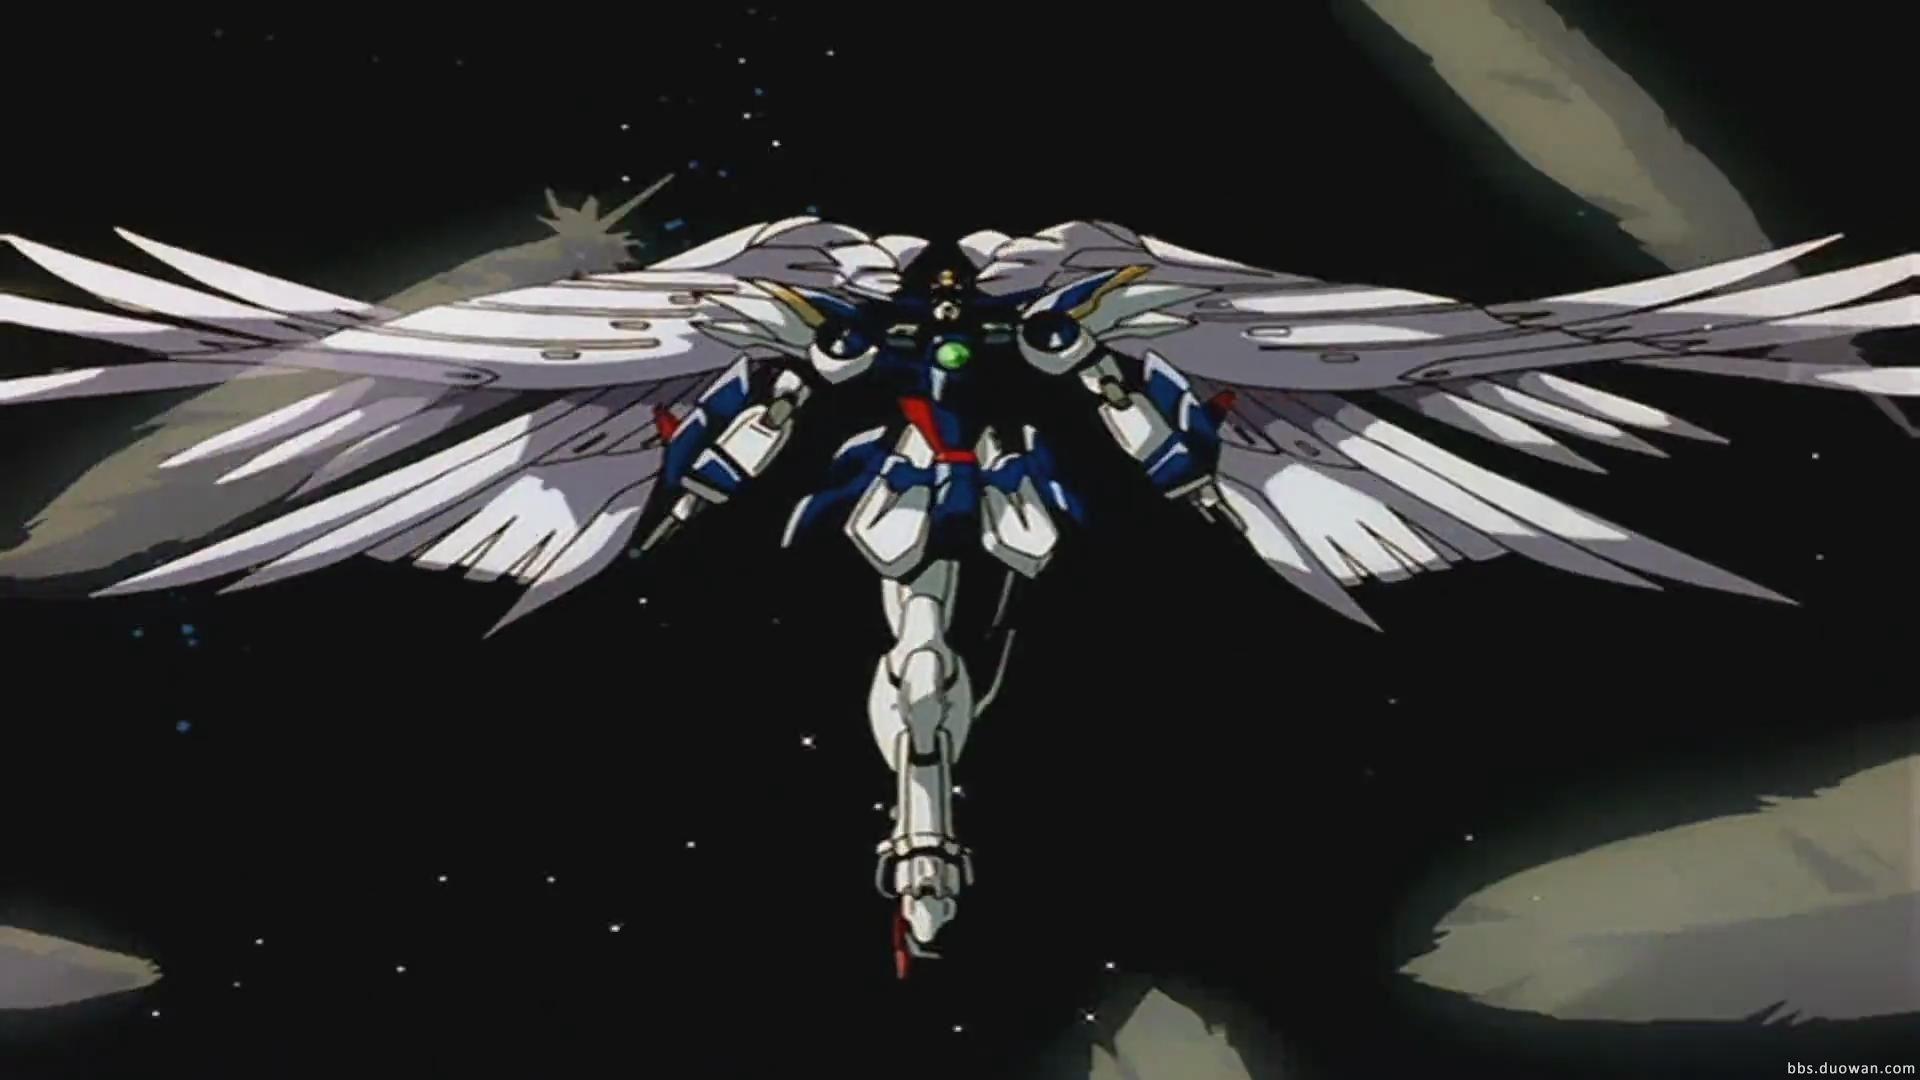 gundam wing zero custom wallpaper 46 images Anime, Anime